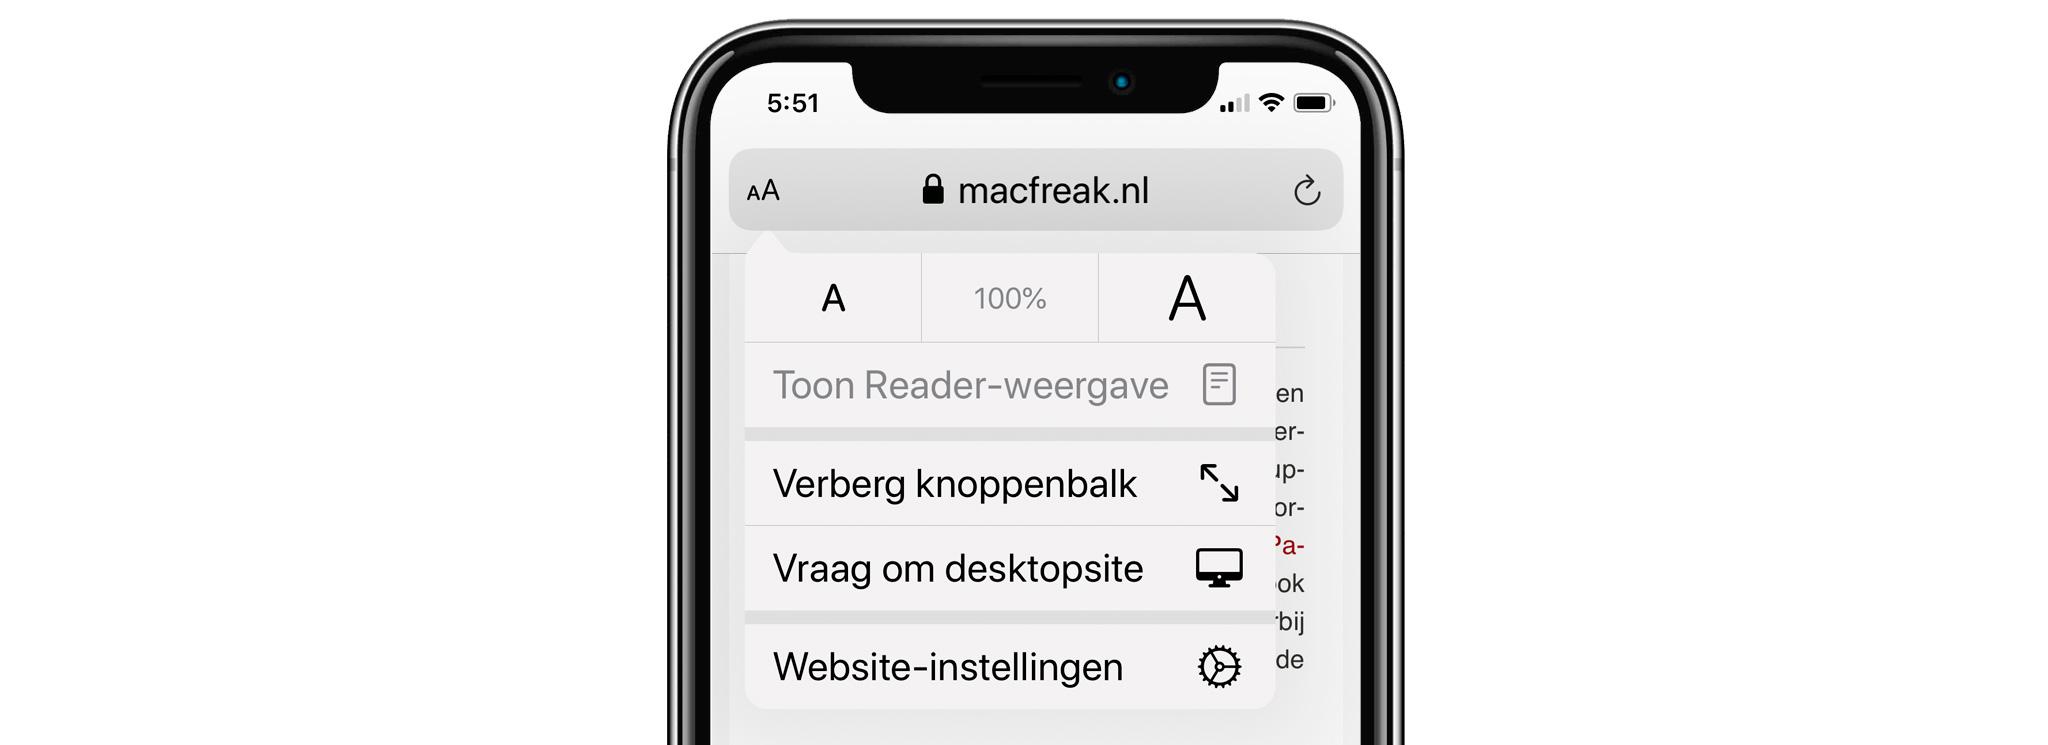 https://www.macfreak.nl/modules/news/images/zArt.iPhoneSafariOptiesMacFreak.jpg